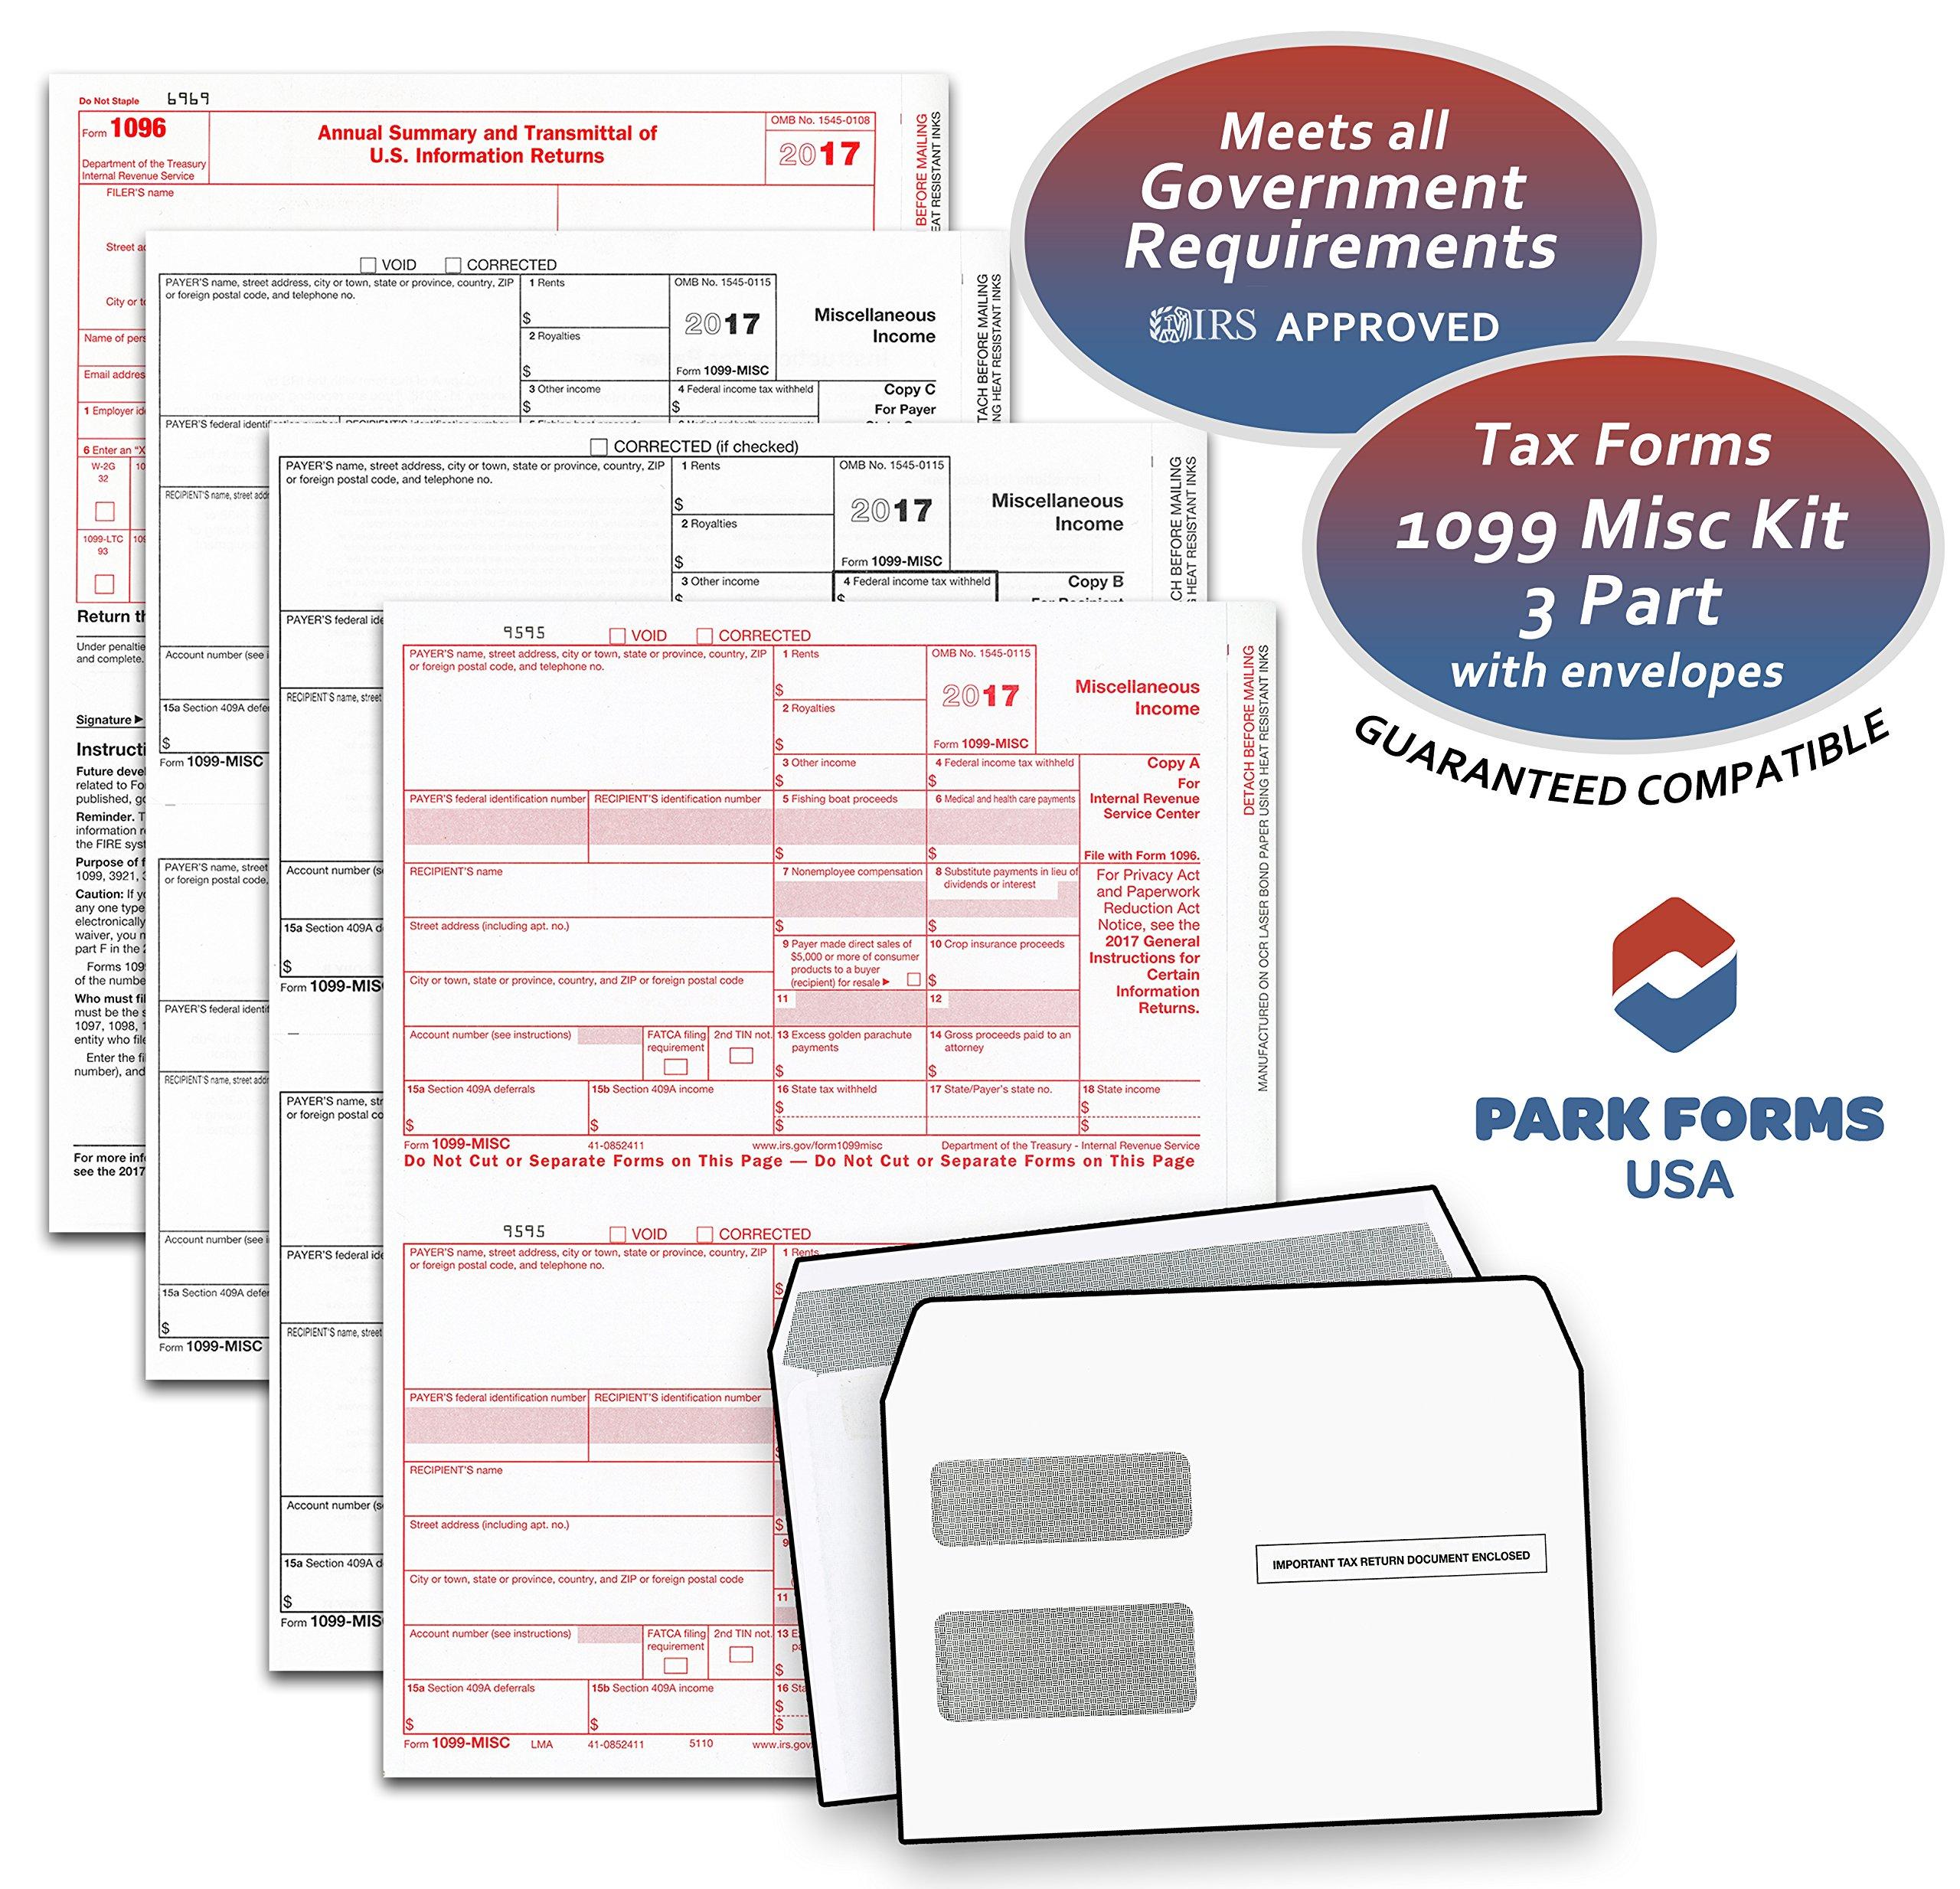 1099 MISC 3-Part Set with Envelopes